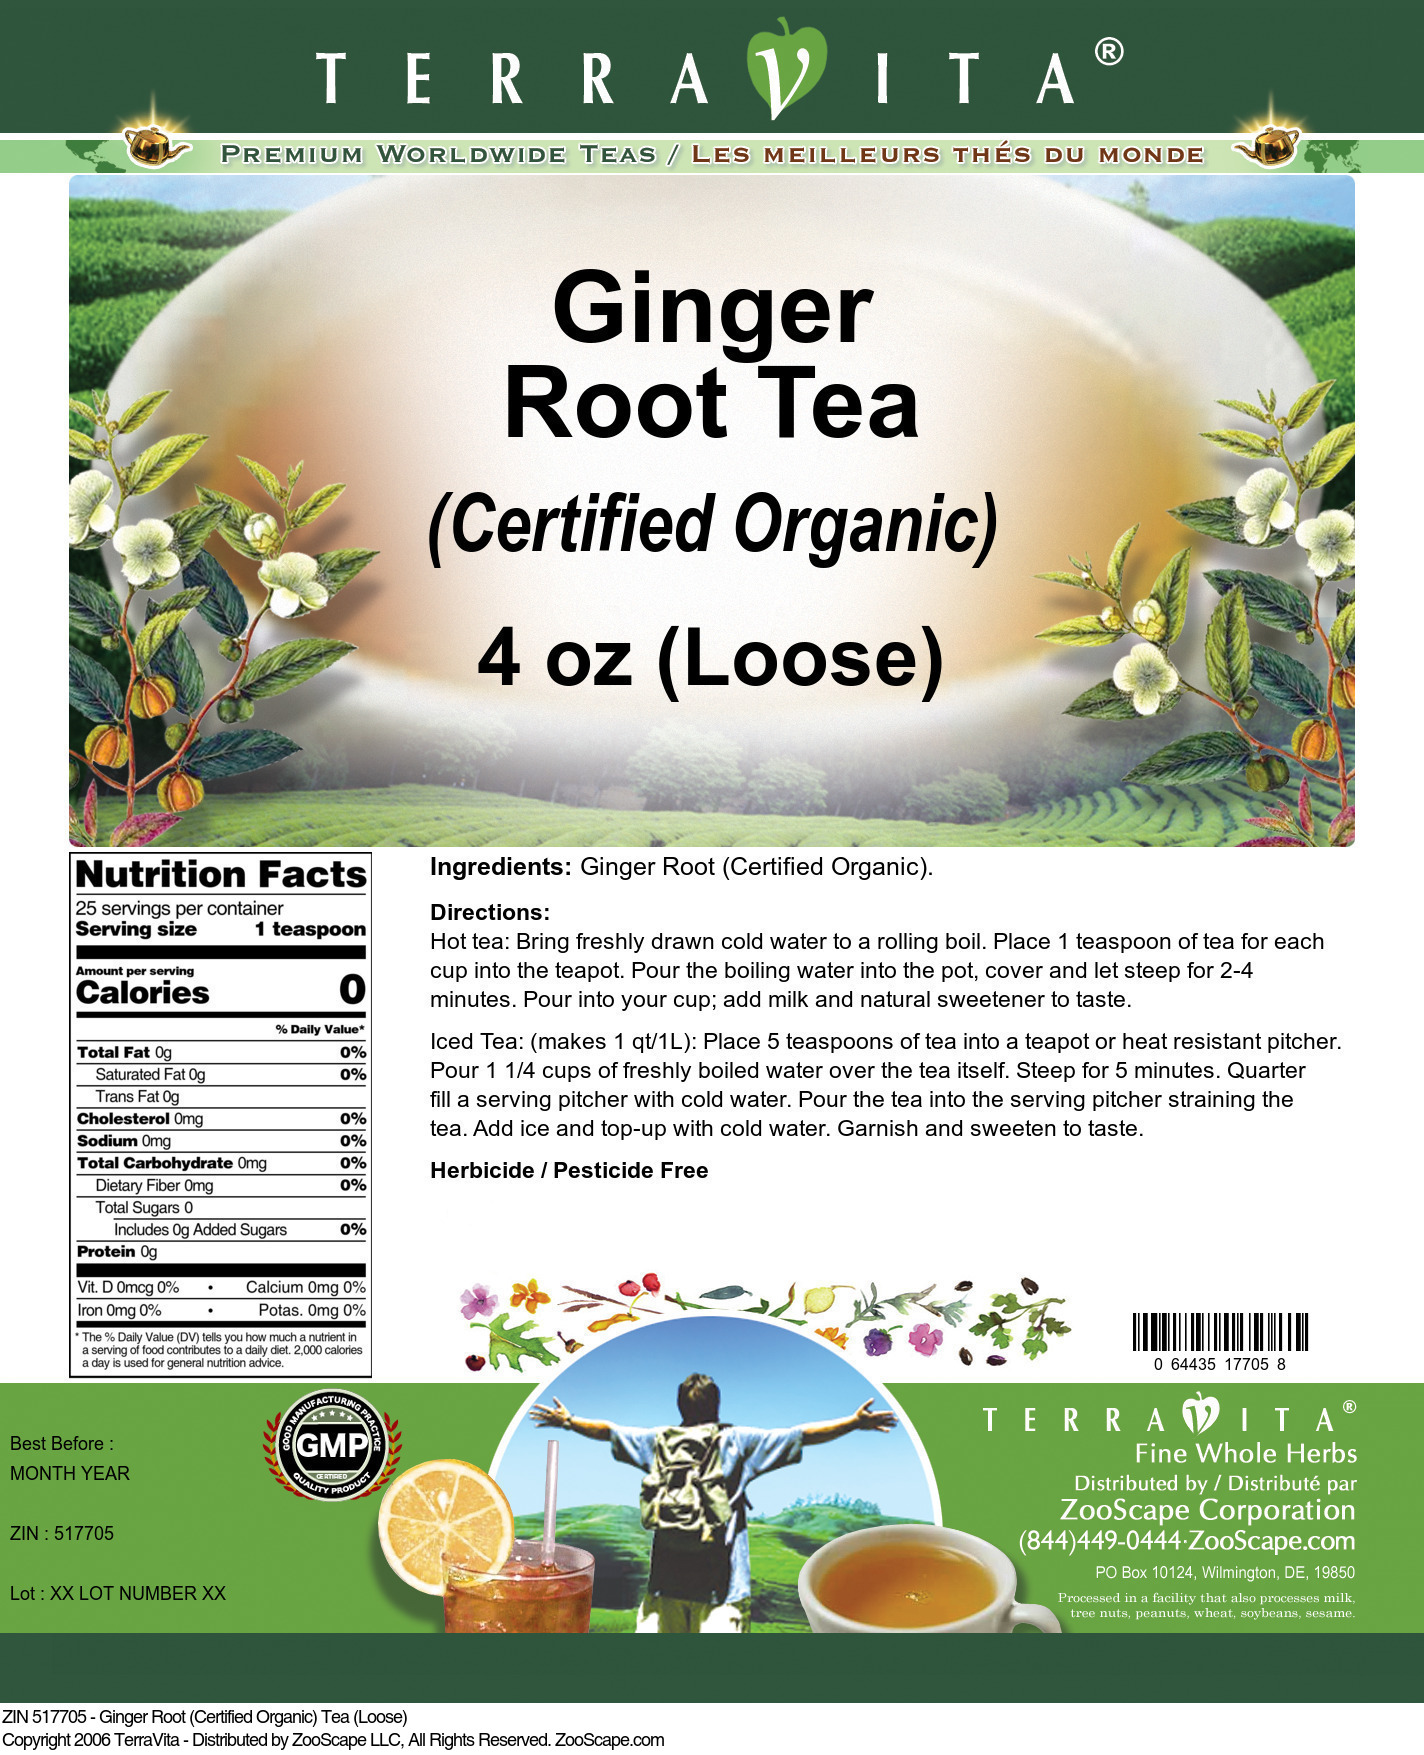 Ginger Root (Certified Organic) Tea (Loose)